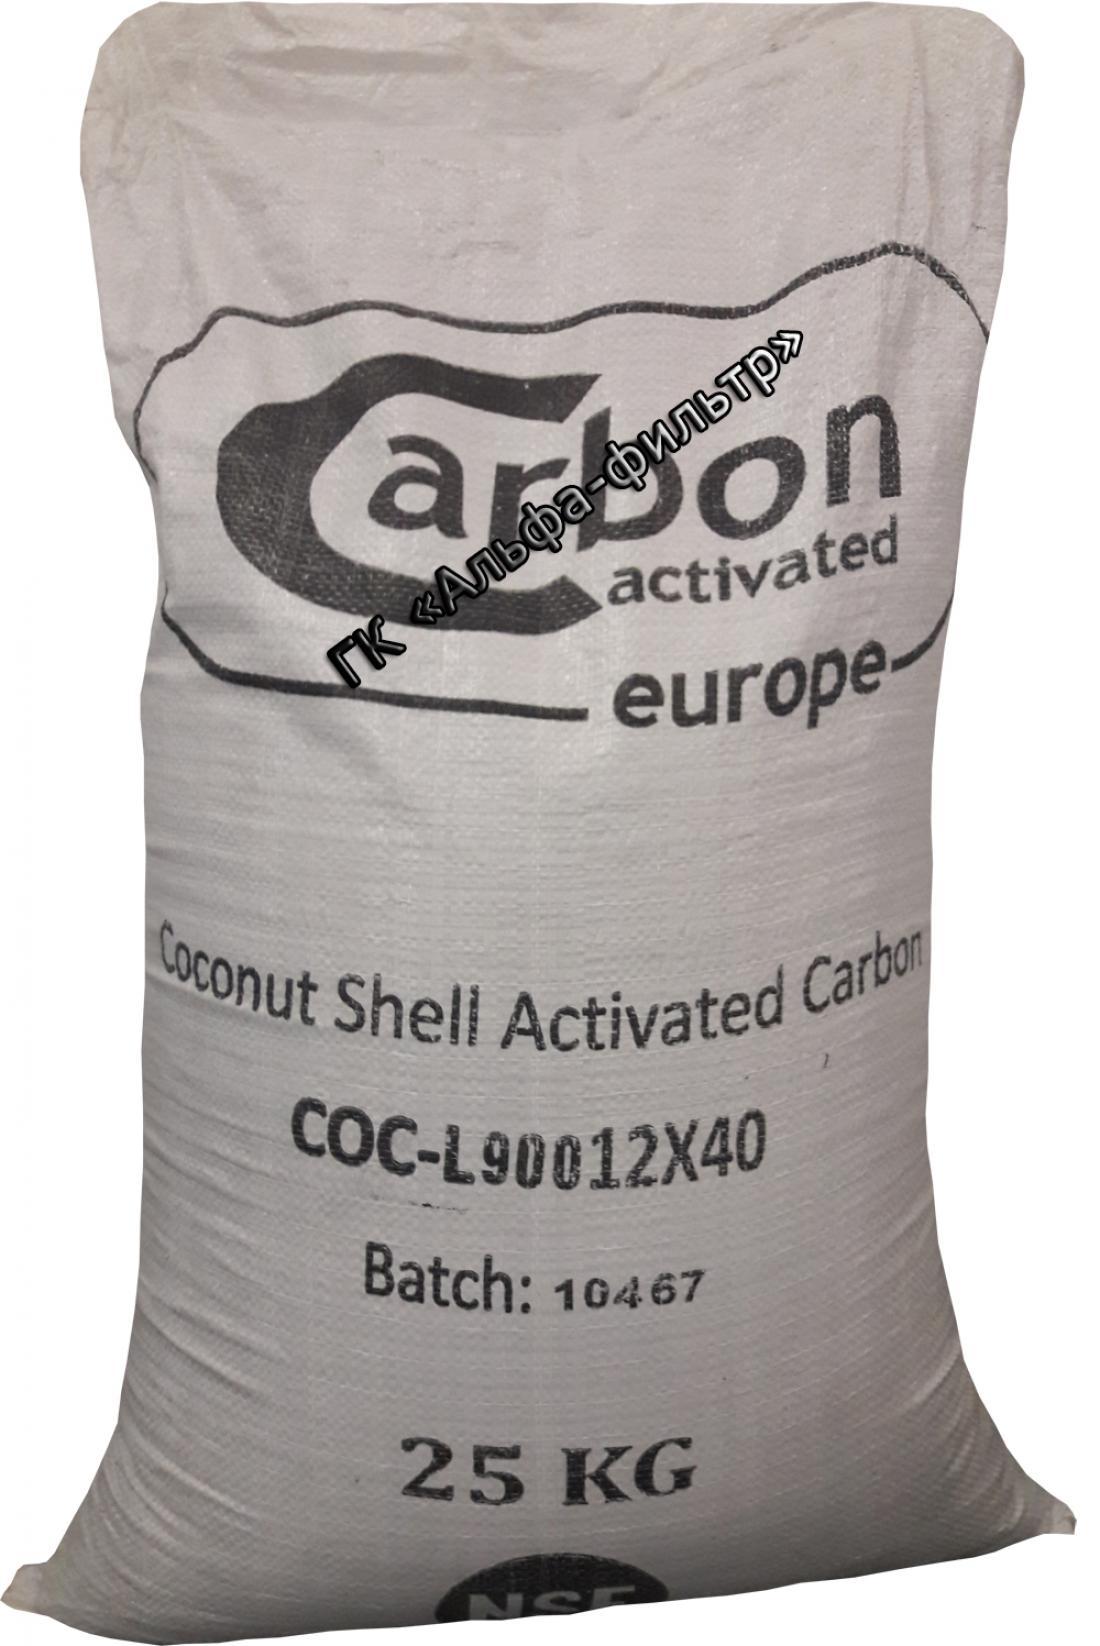 Company Profile  CarboTech GmbH